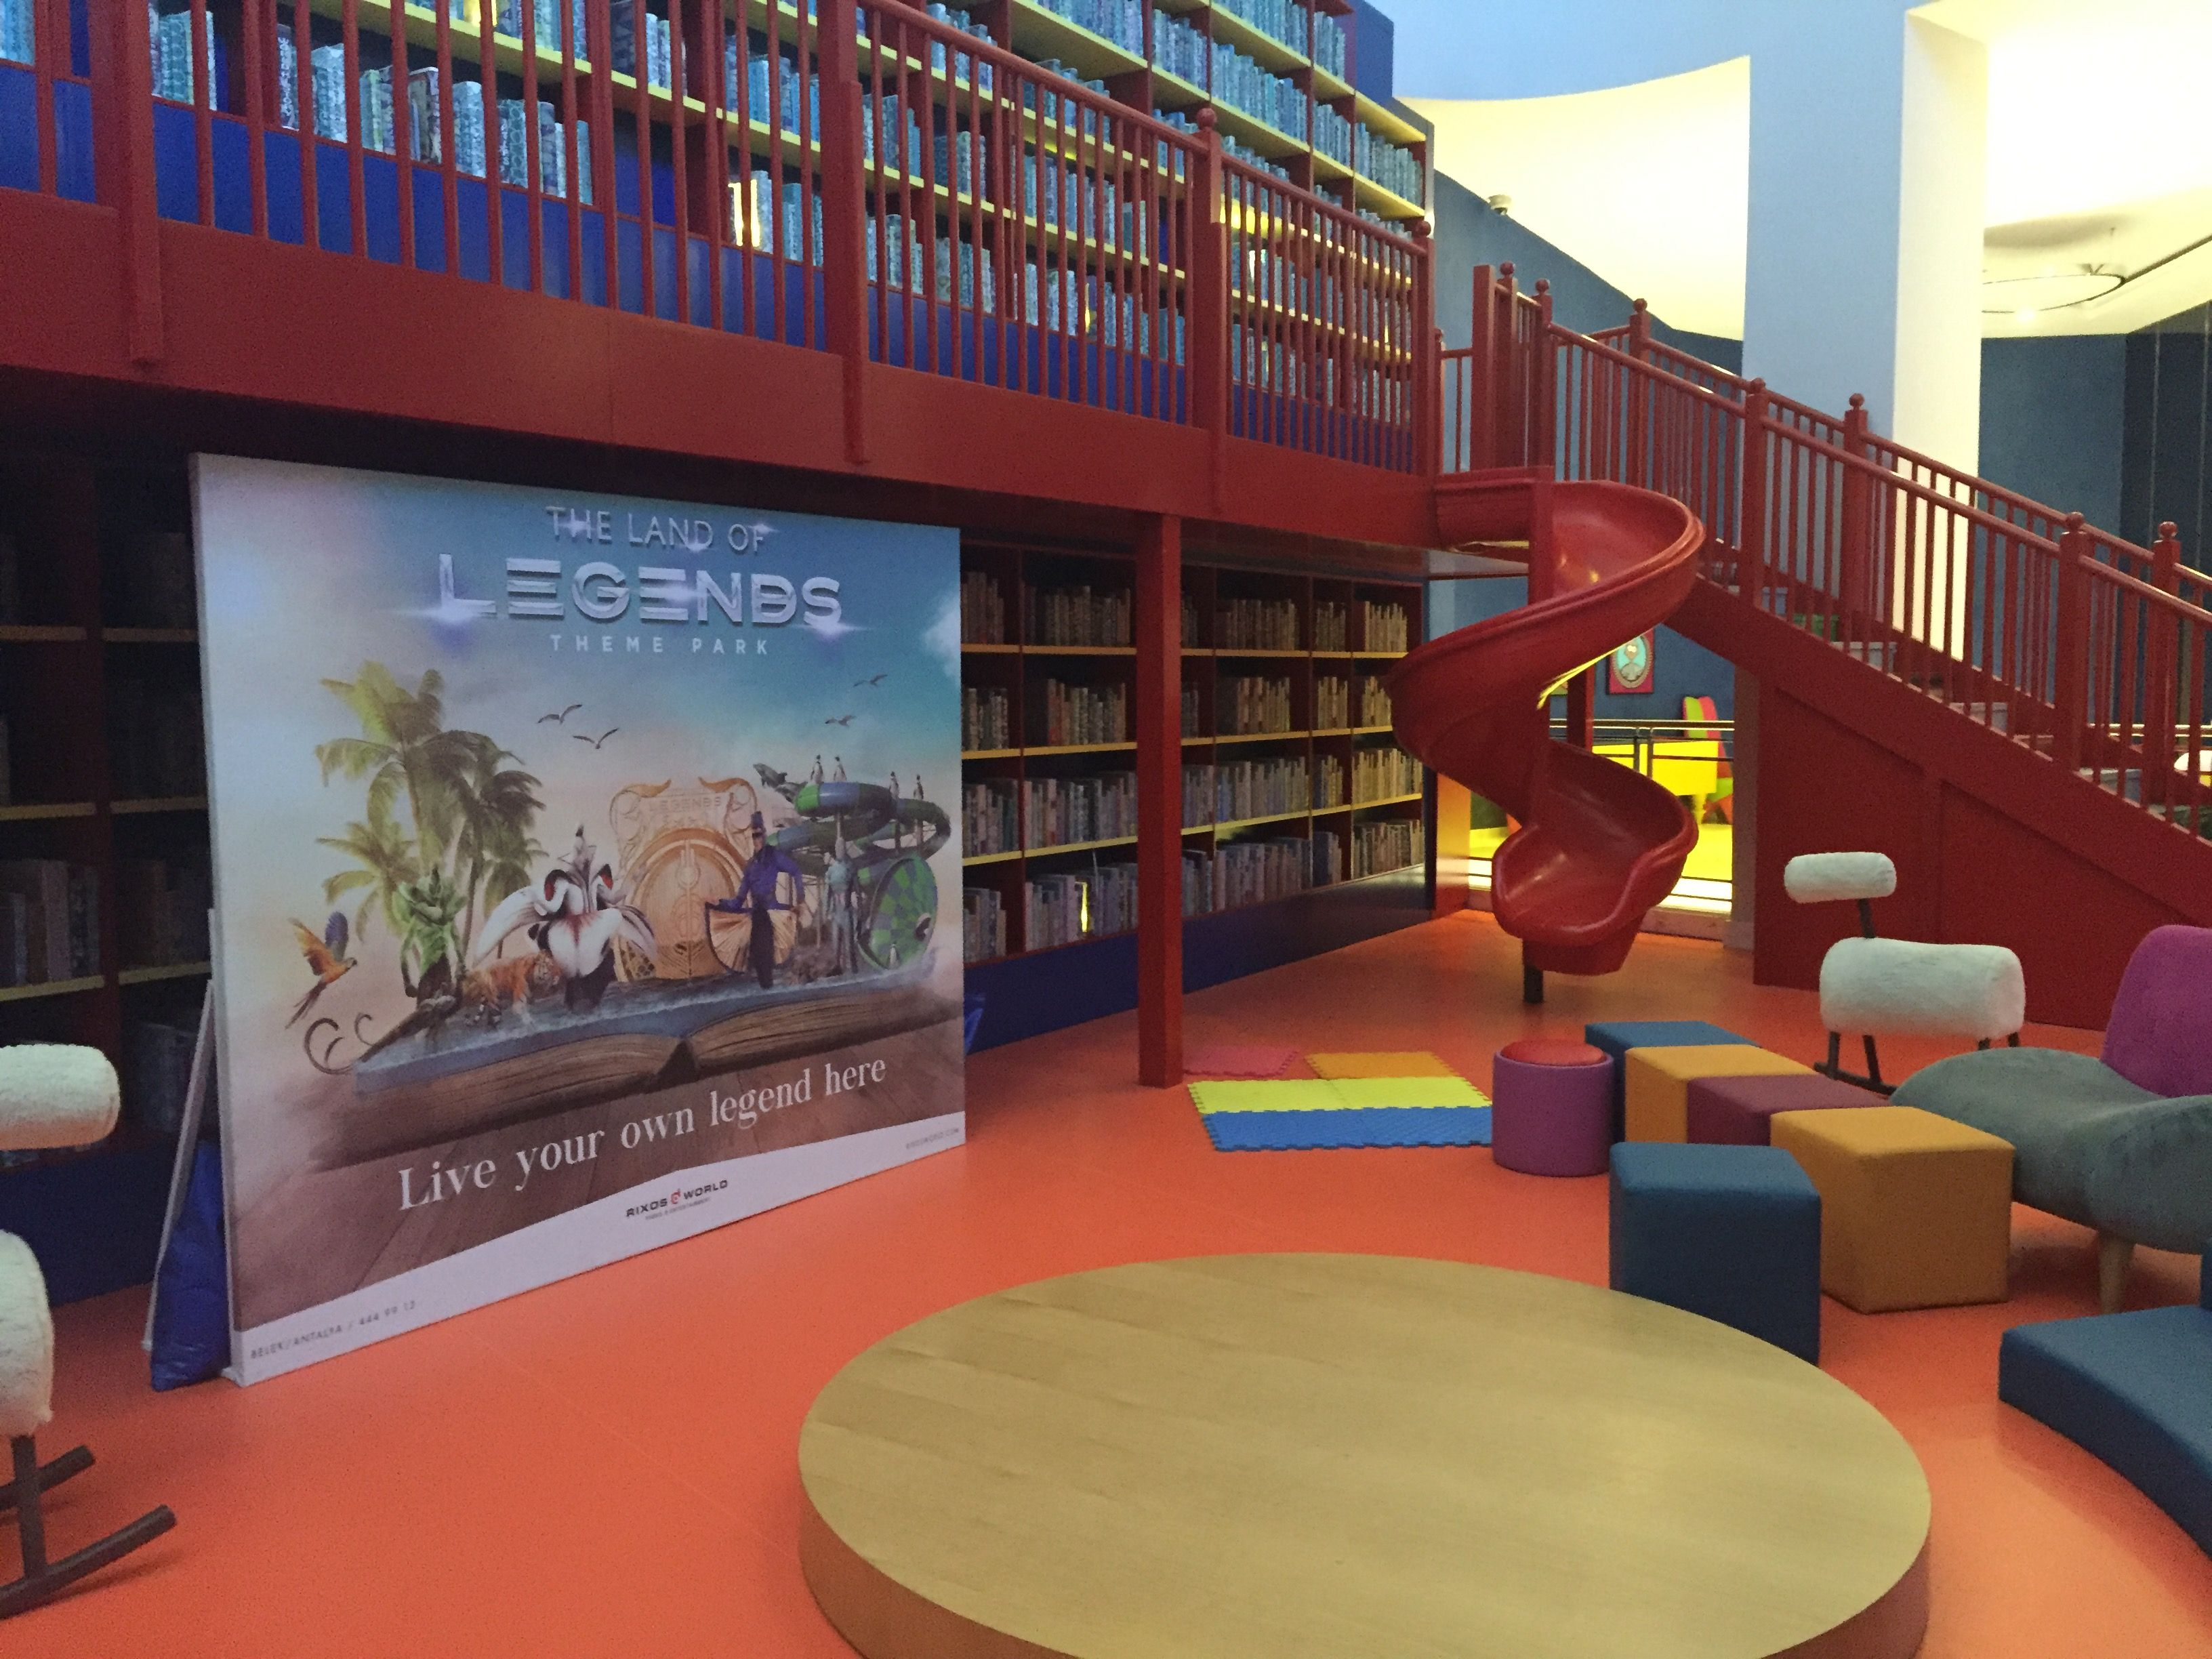 Rixos Land of Legends Belek Turkey 🇹🇷 #hotel #aquapark #Belek #Turkey #hoteldesign #kids #library